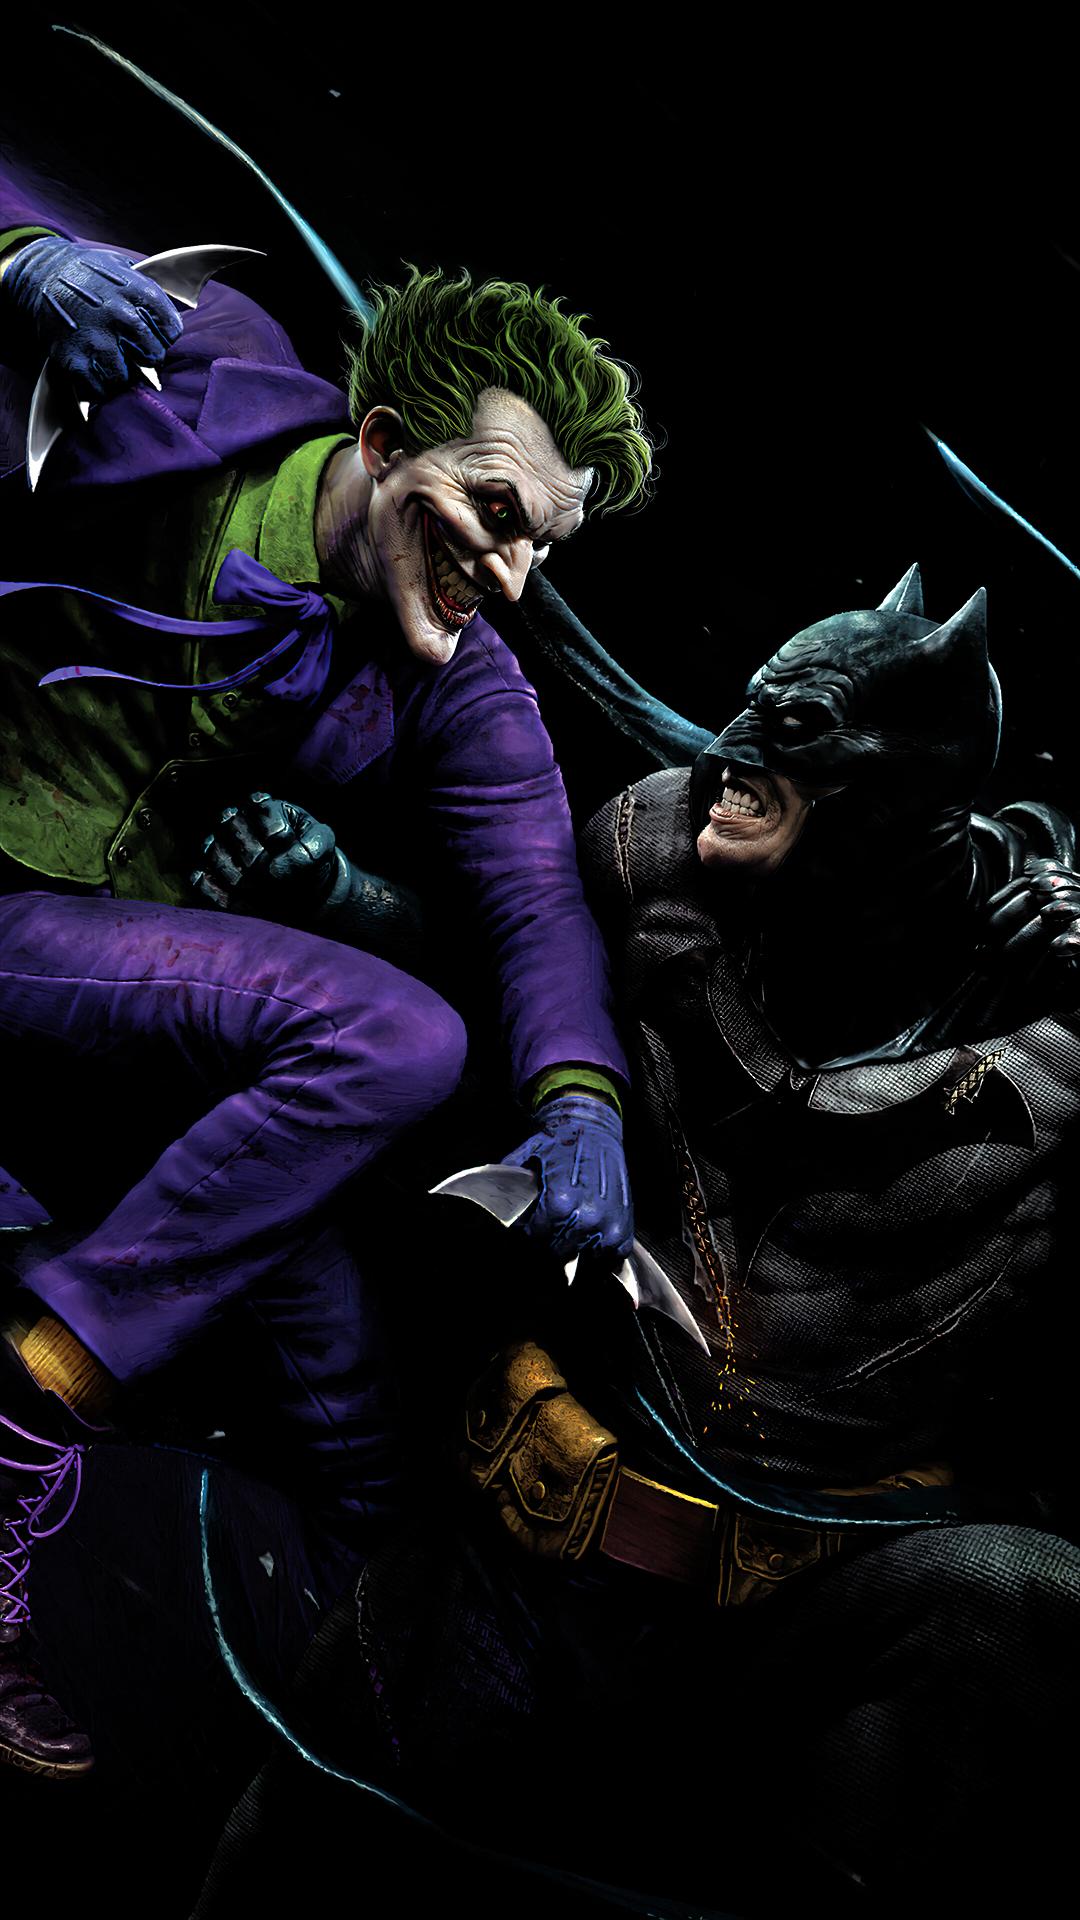 Joker vs. Batman wallpaper phone